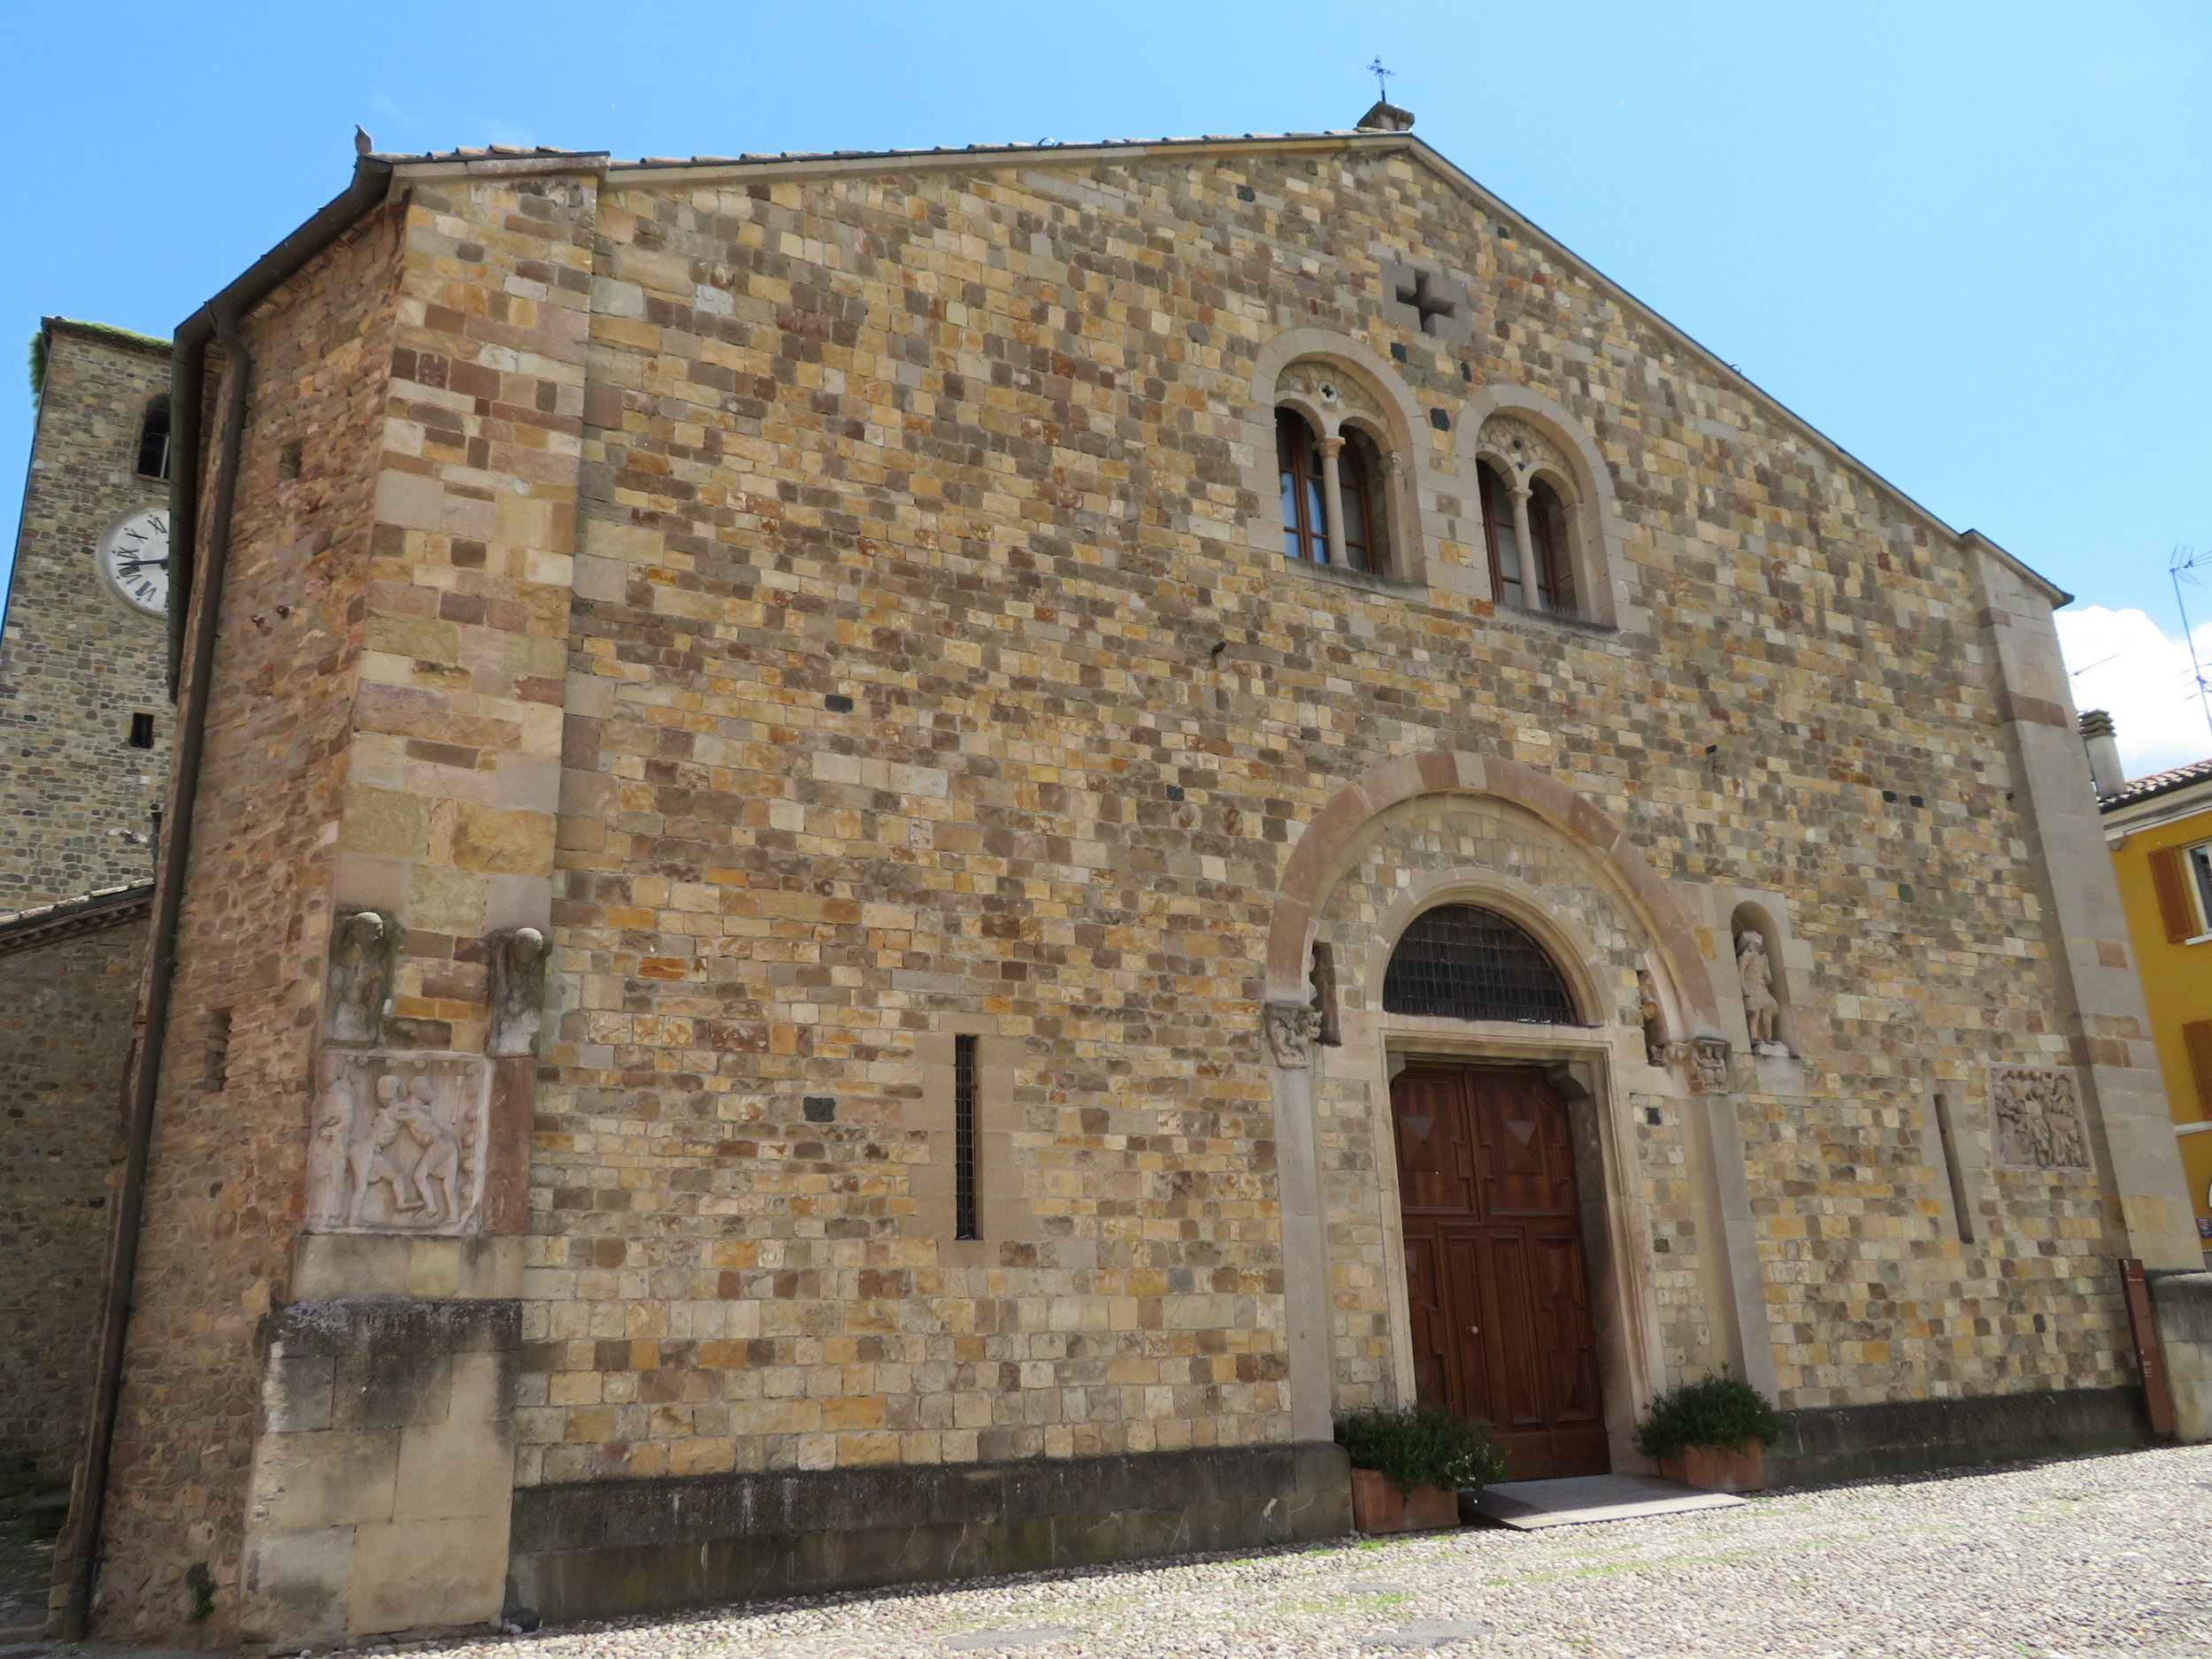 cassio-fornovo_assumption of Mary parish church c.854.JPG